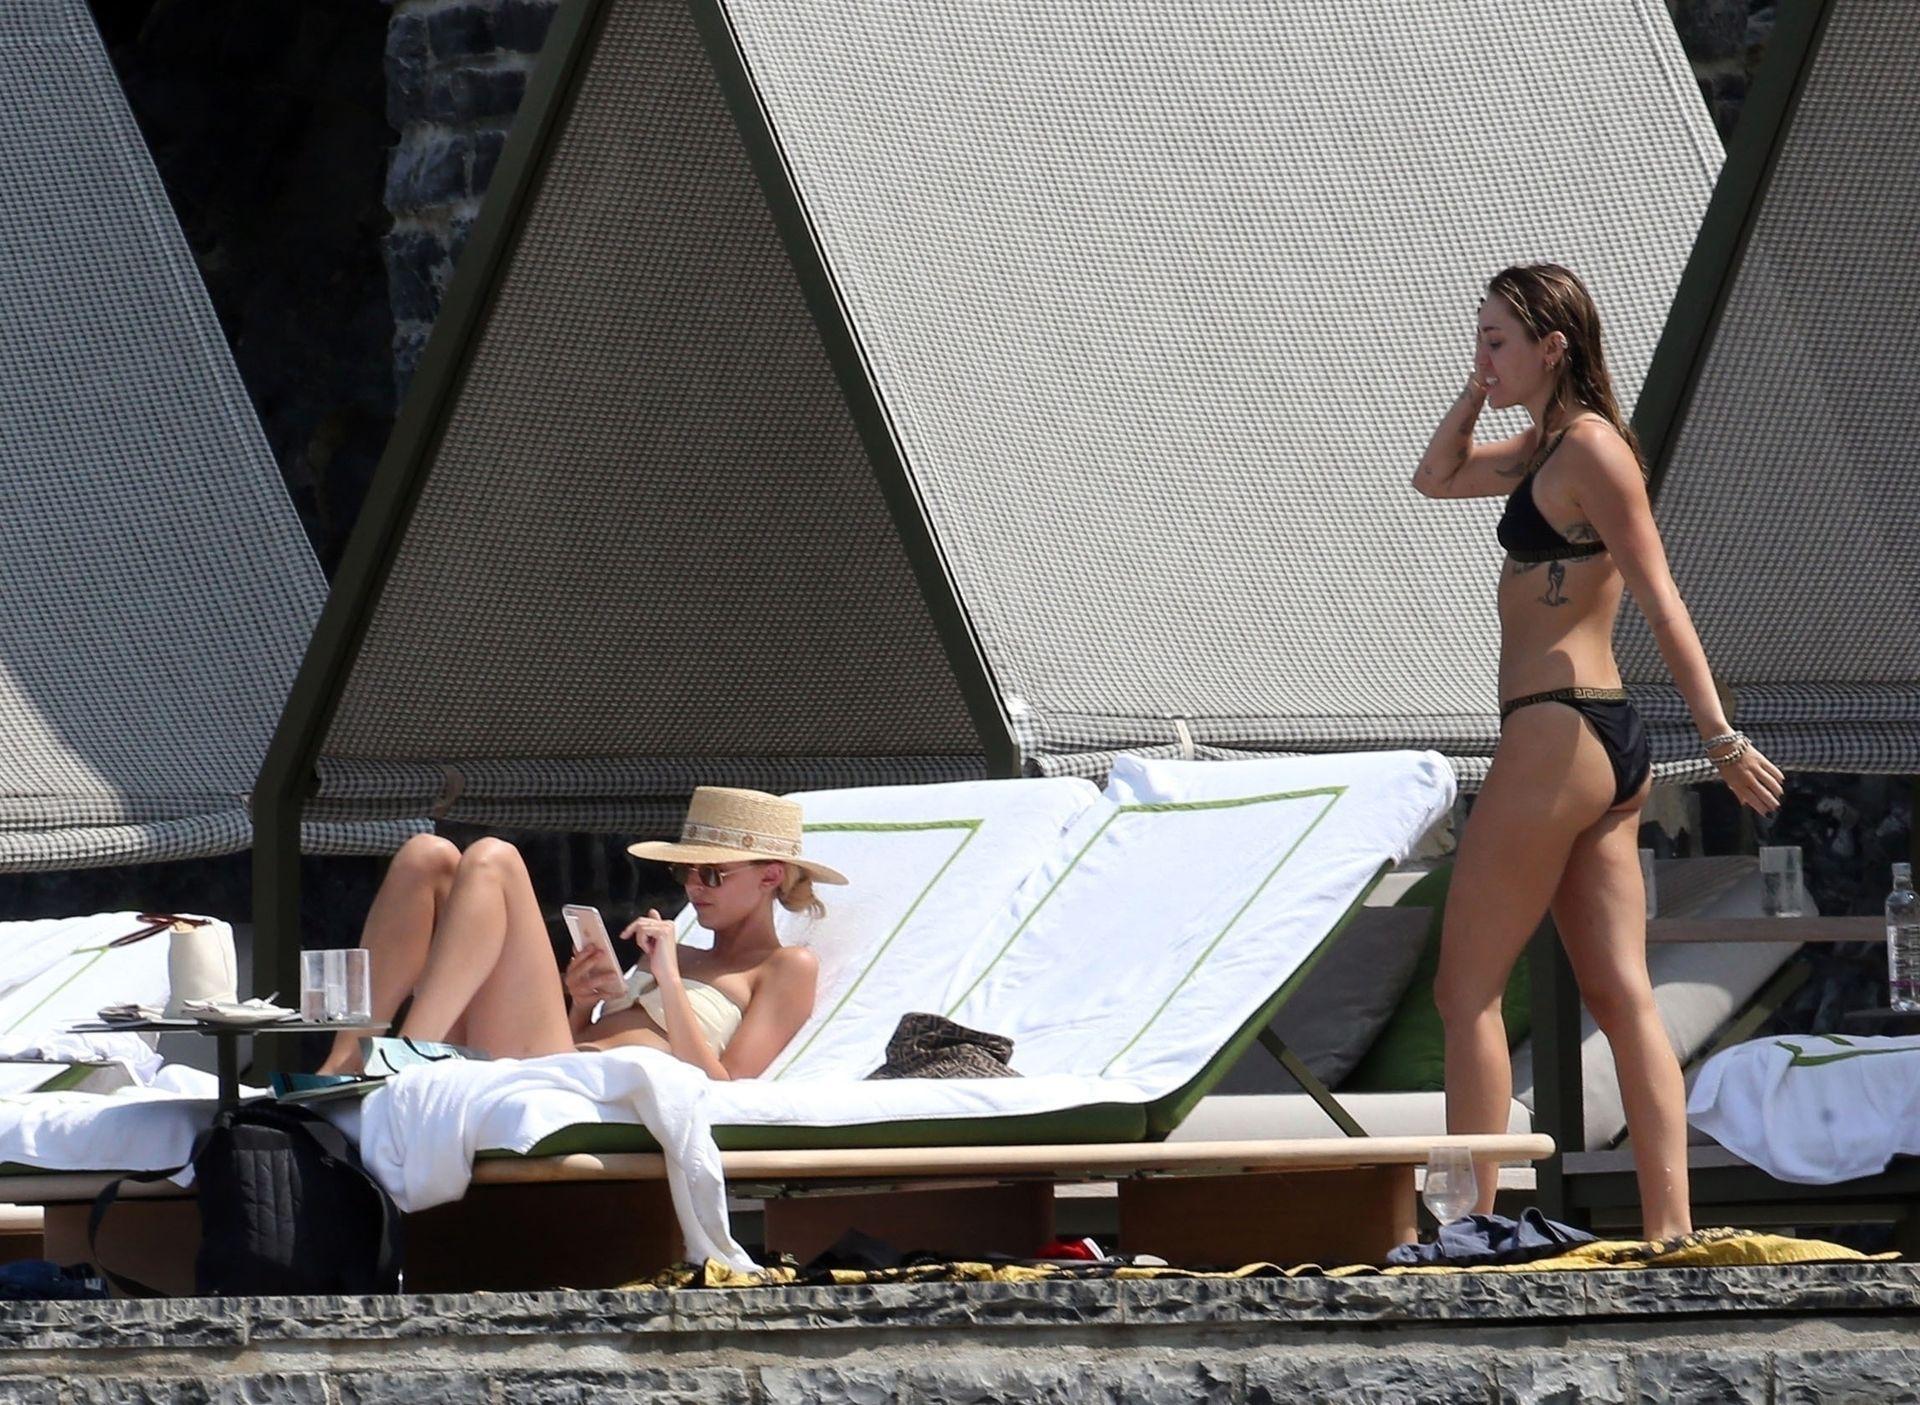 0713004446900_07_Miley-Cyrus-Topless-Kaitlynn-Carter-Hot-TheFappeningBlog.com-7.jpg